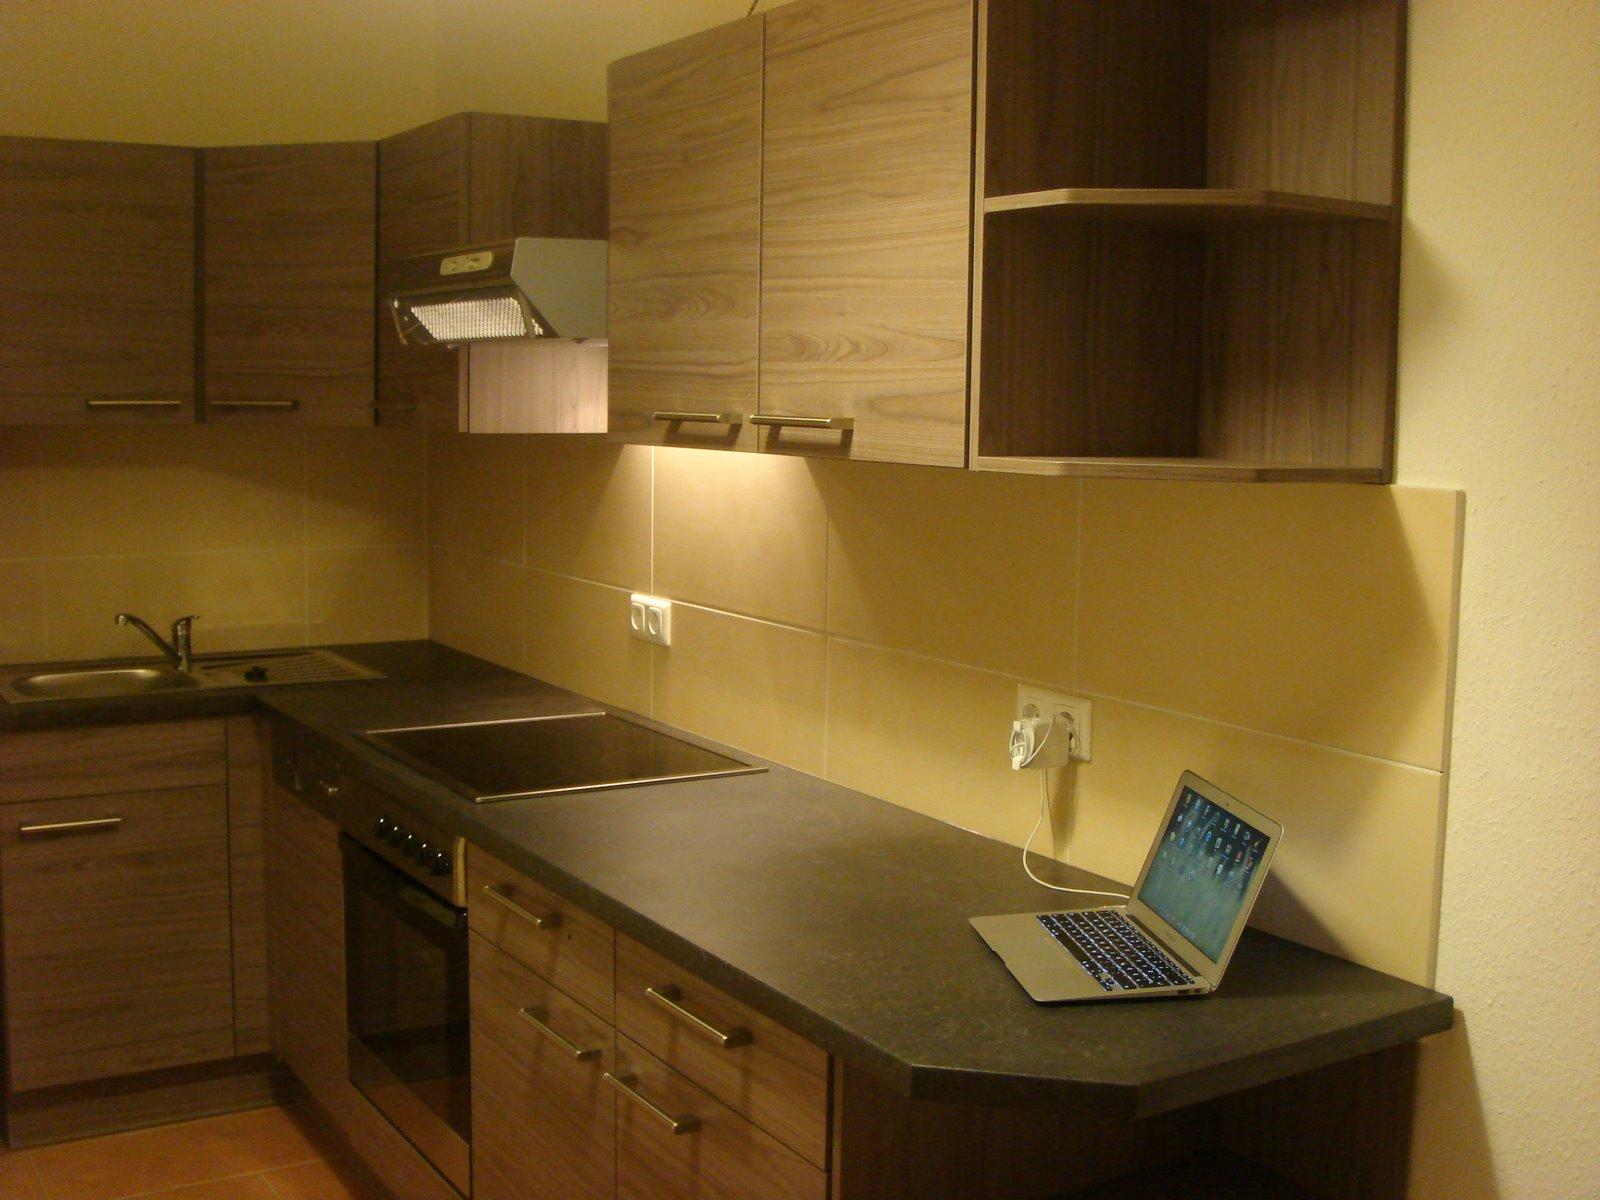 dietzis blog lange blieb die k che kalt. Black Bedroom Furniture Sets. Home Design Ideas